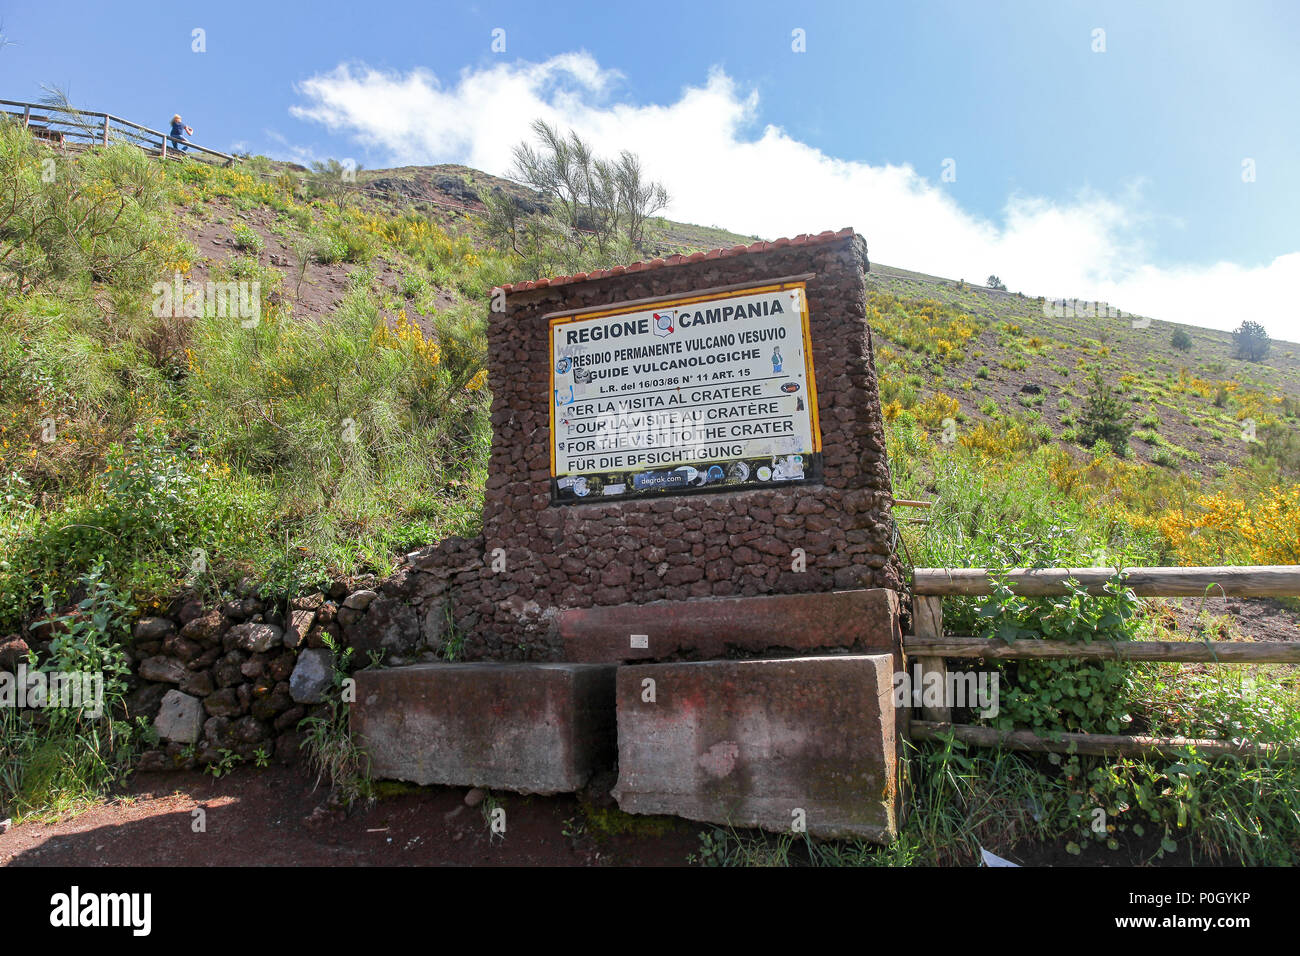 A notice or sign board at Vesuvius, Mount Vesuvius or Vesuvio, an active volcano above the Bay of Naples on the plain of Campania in Italy - Stock Image